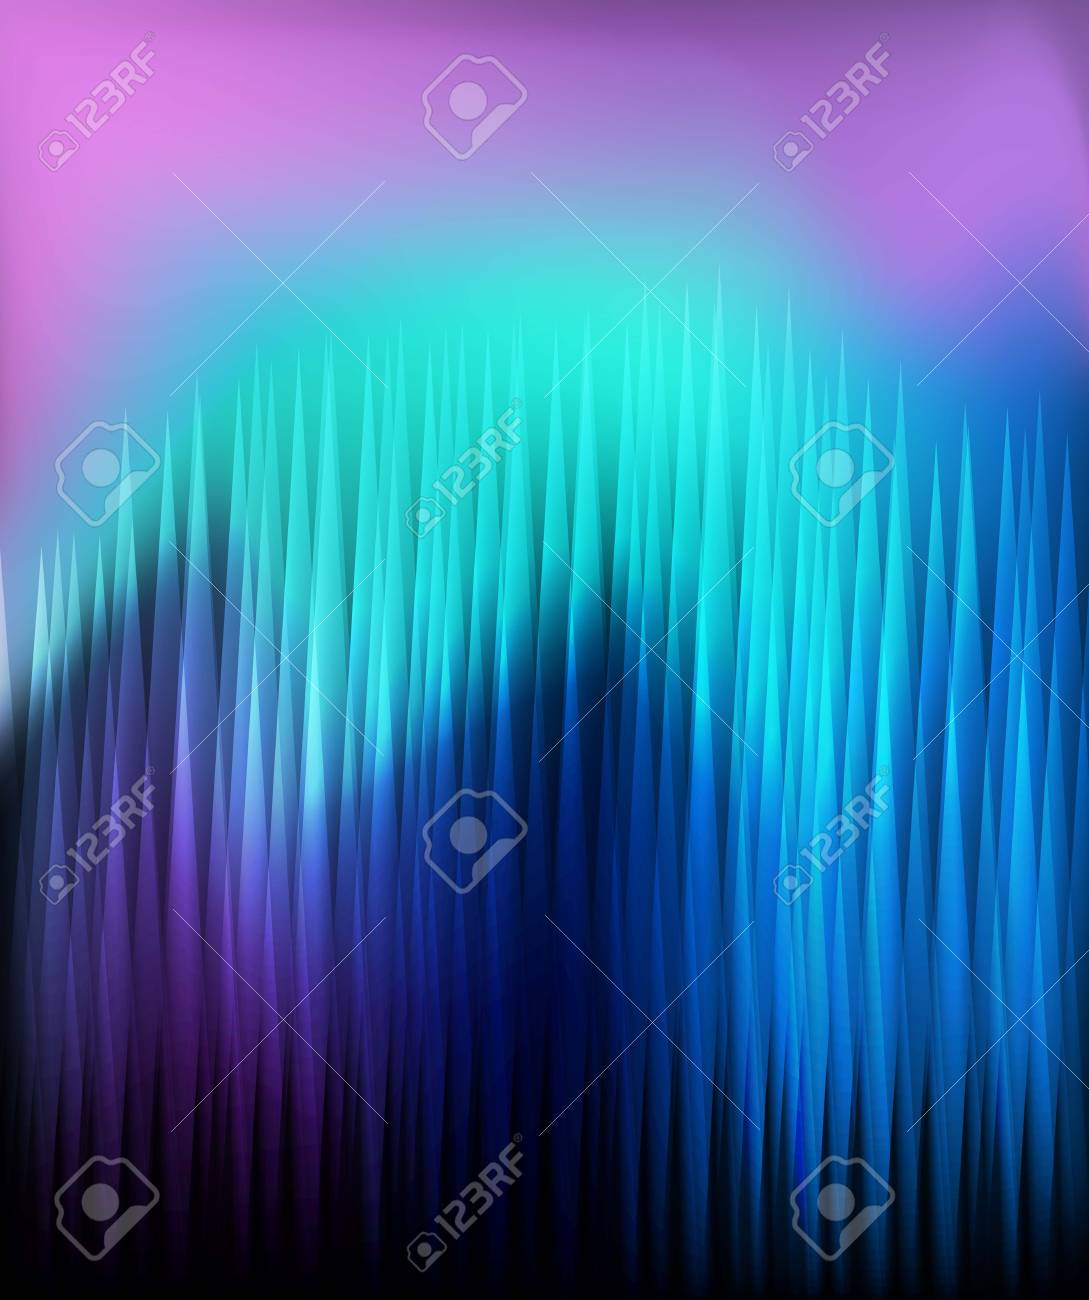 Neon abstract lines design on dark background vector concept Stock Vector - 17408028